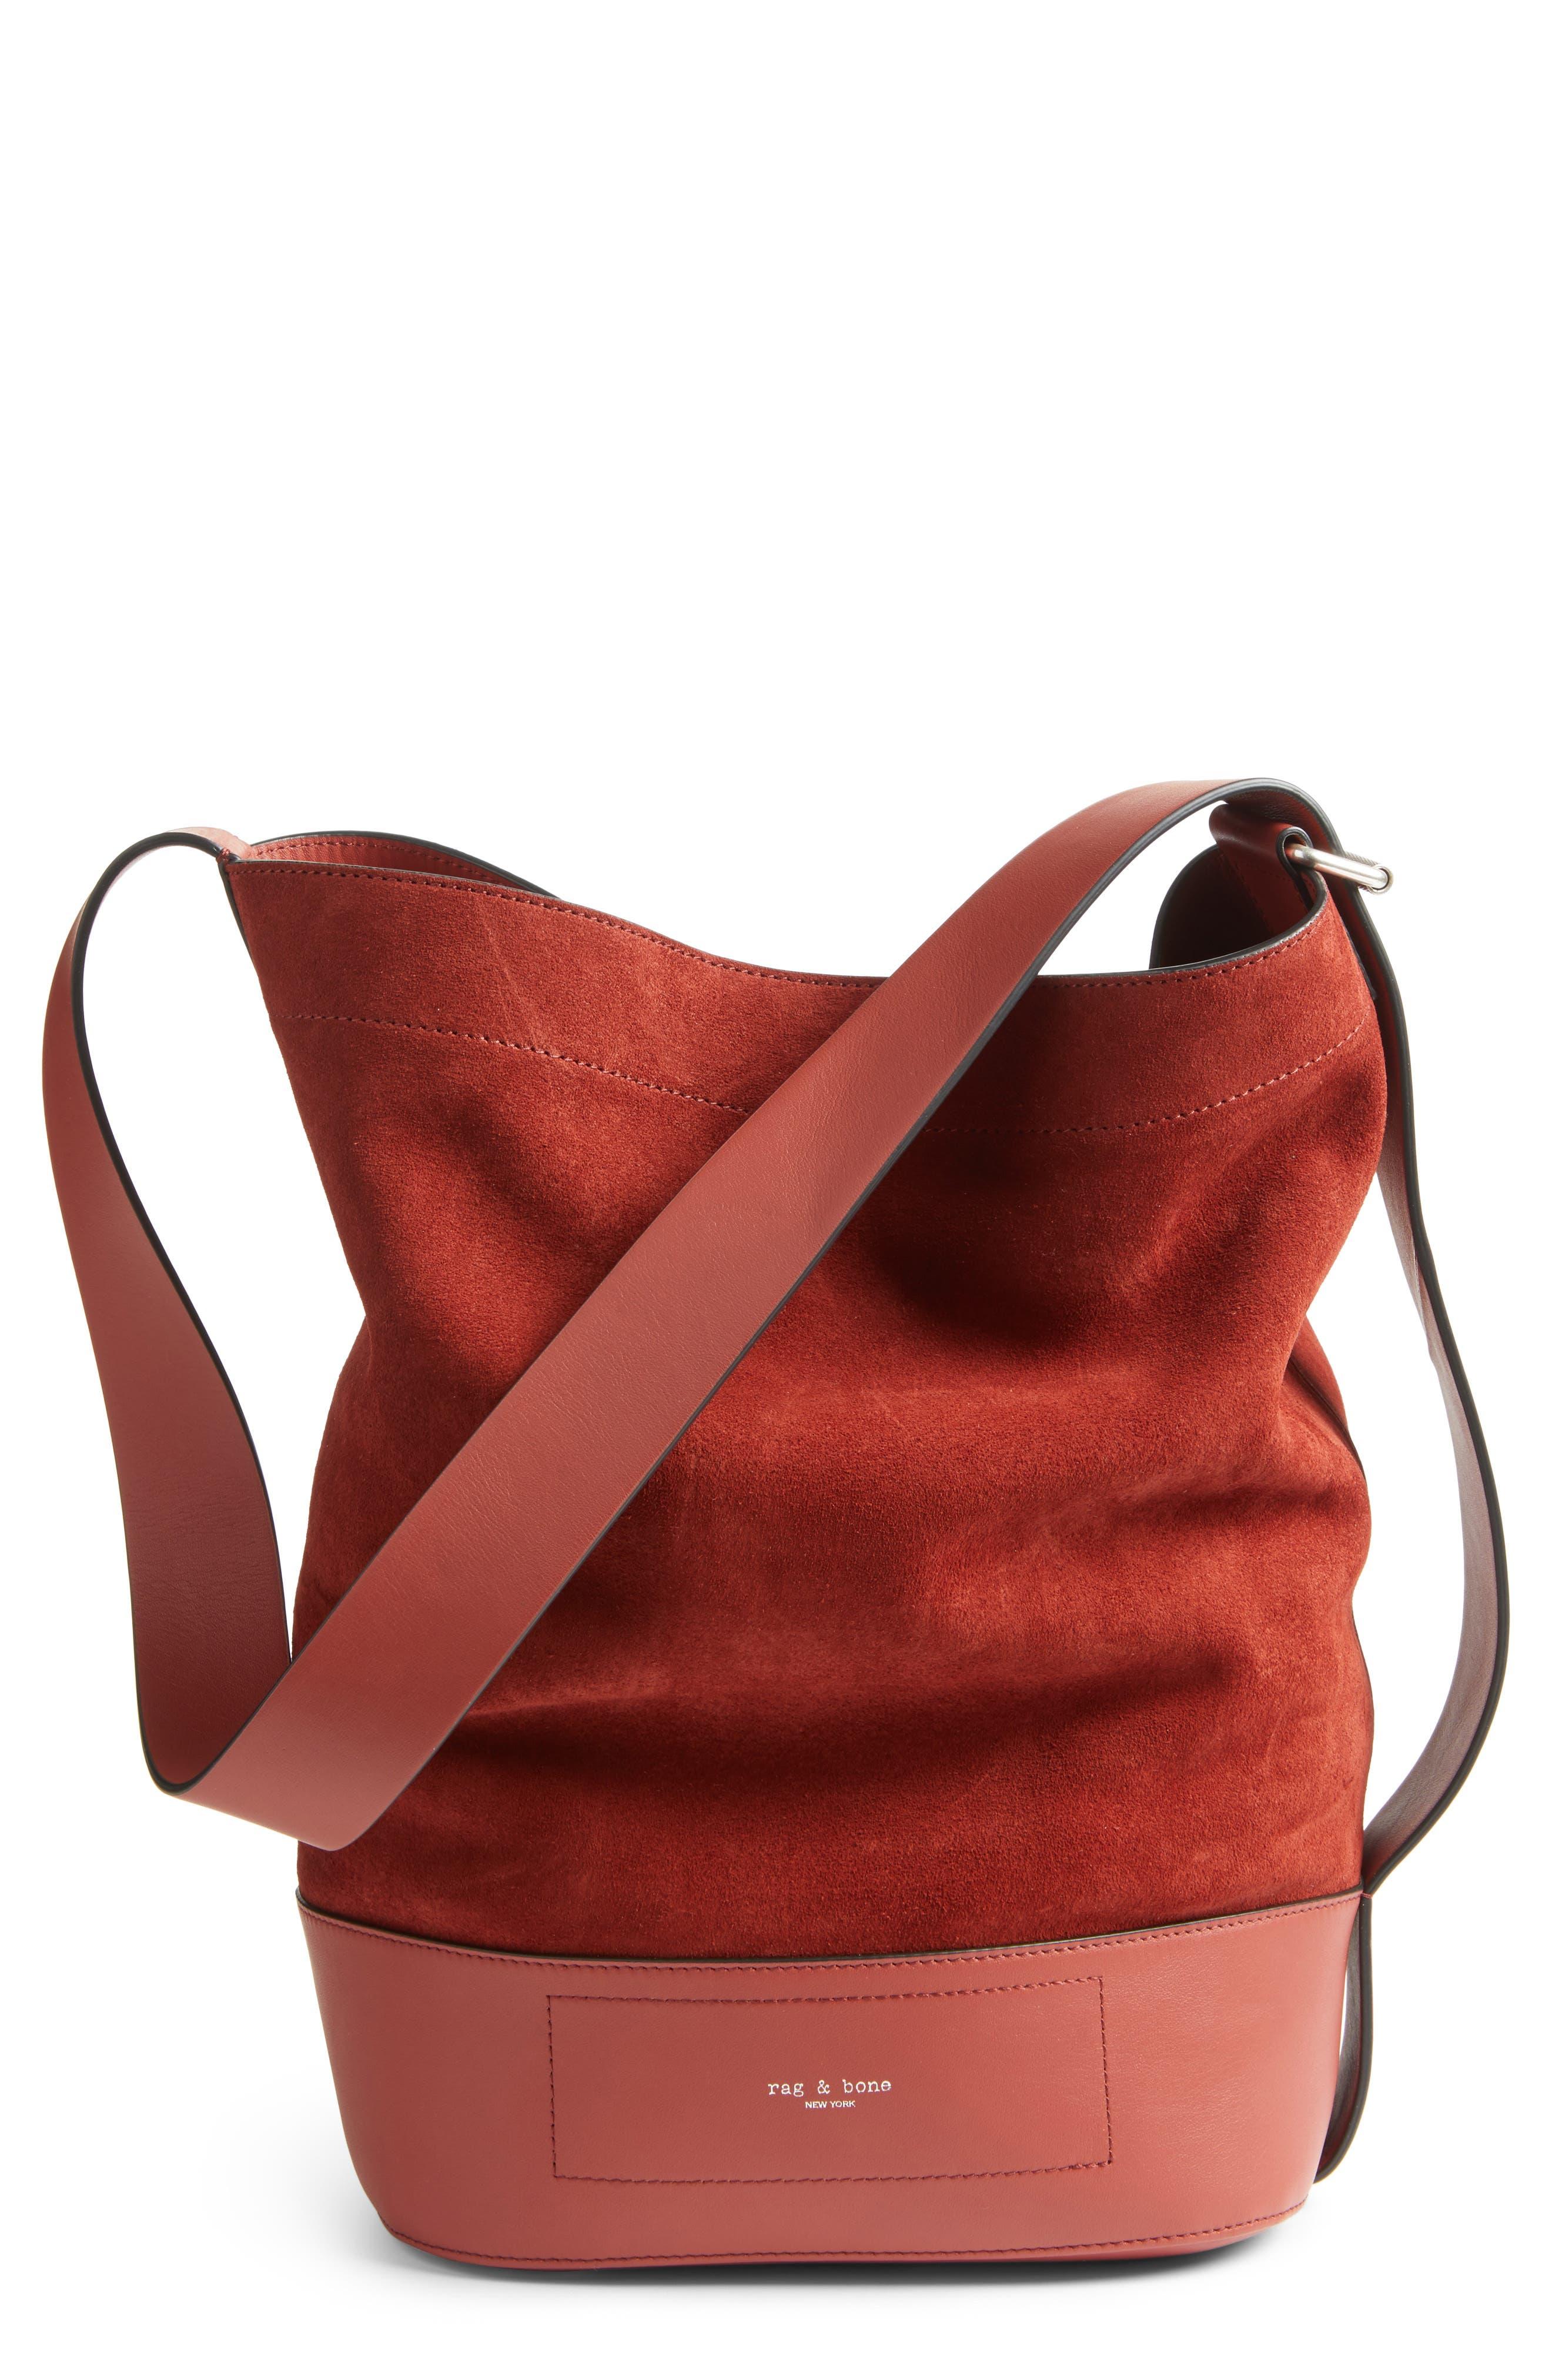 Main Image - rag and bone Walker Sling Leather & Suede Bucket Bag